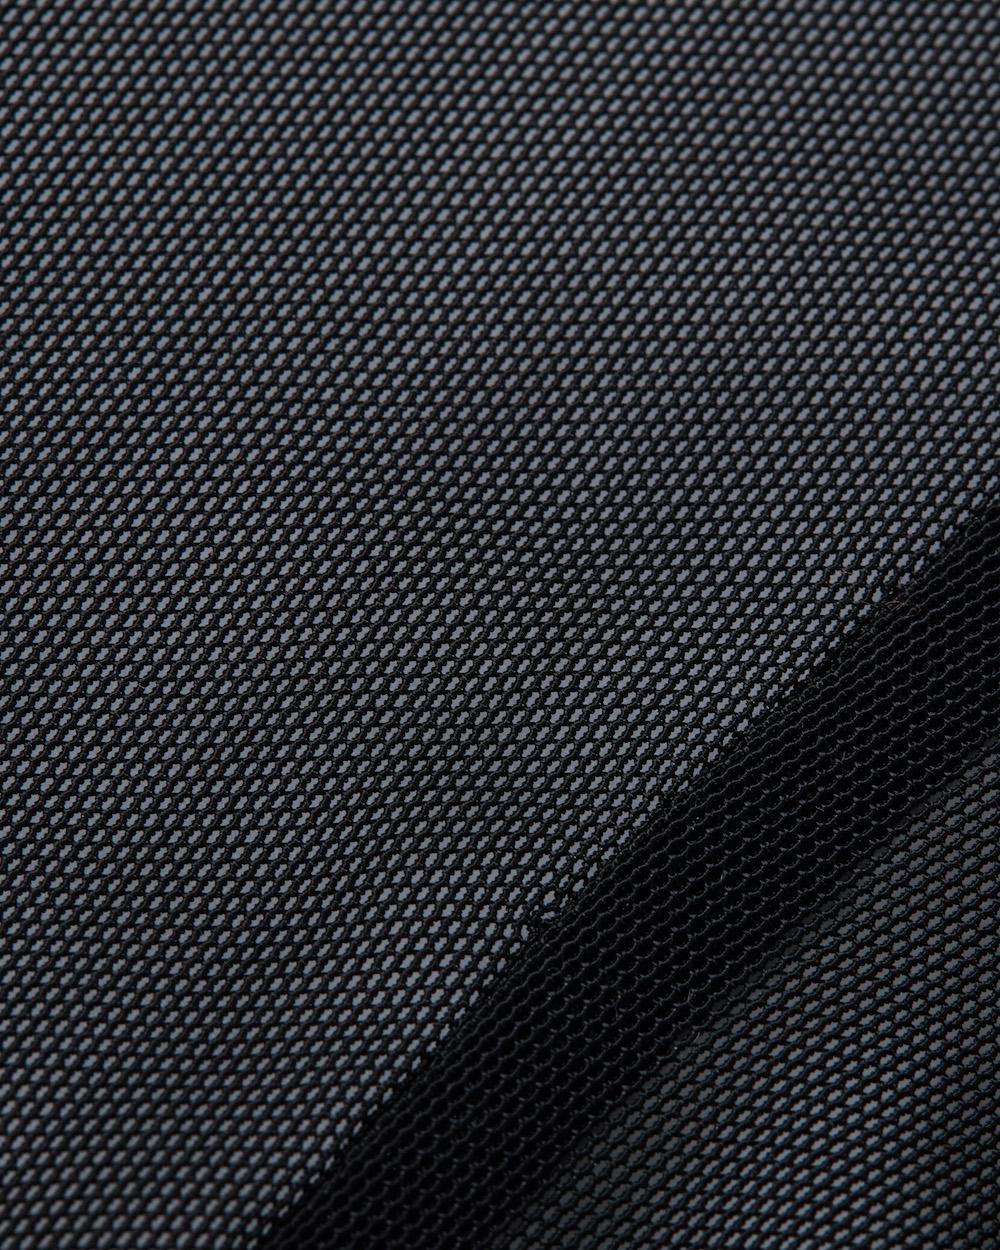 52d01e853eb1 Bohn Body Armor Cool-Air Mesh Riding Shorts Black Fabric Swatch